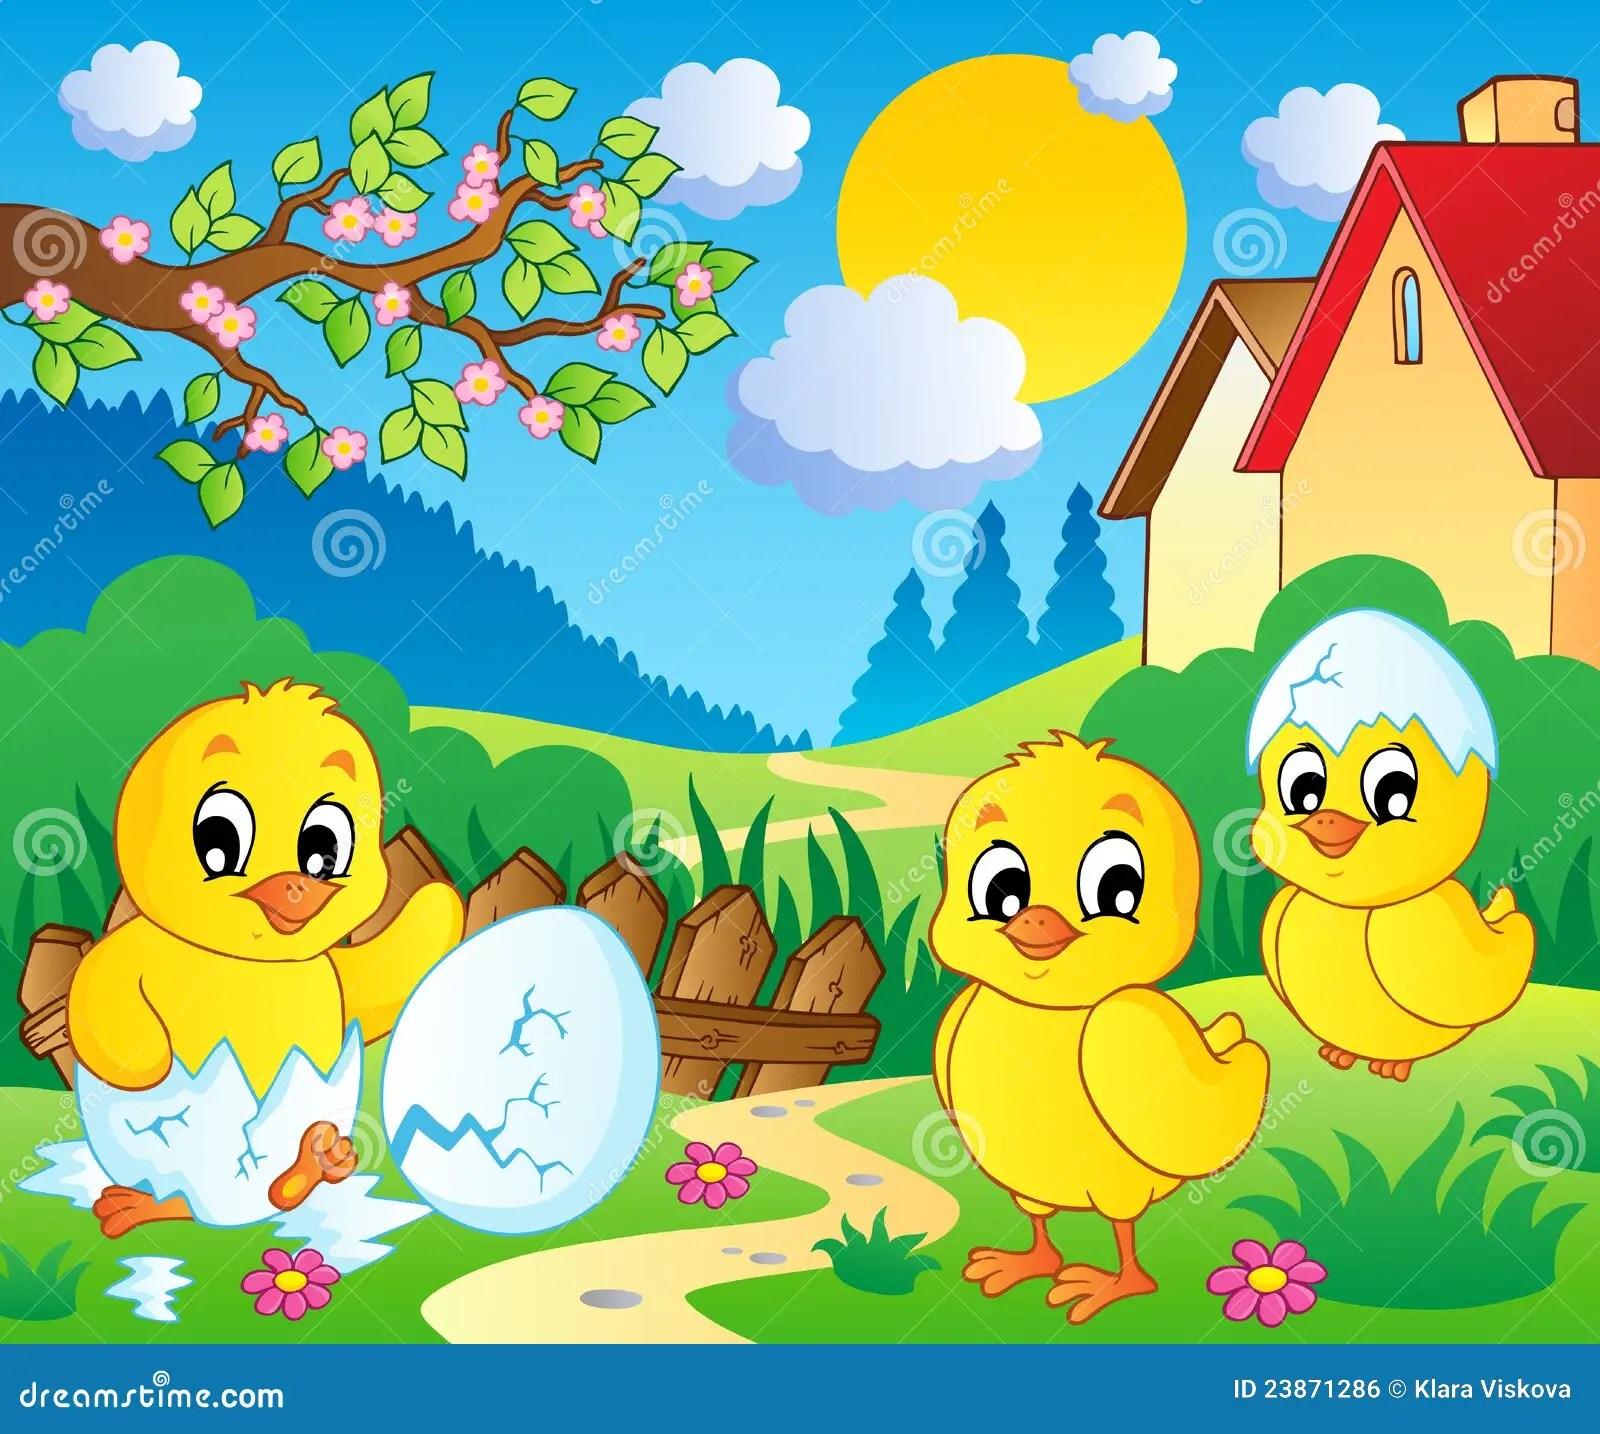 Fall Farm Desktop Wallpaper Scene With Spring Season Theme 2 Stock Vector Image